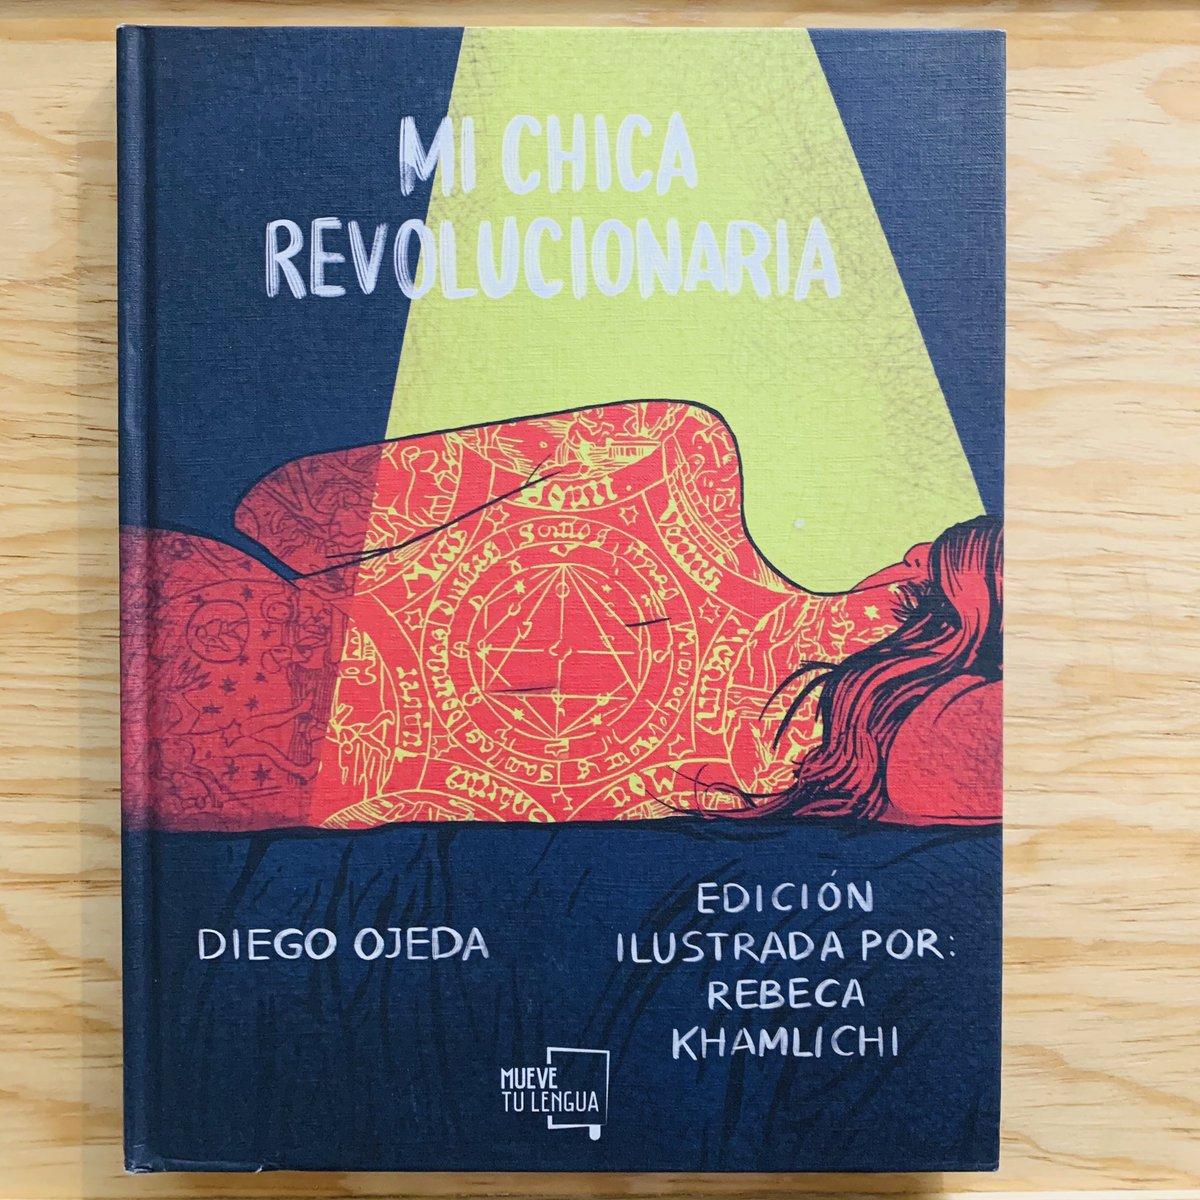 Mi chica revolucionaria ilustrado  @diegoojeda85 @RebecaKhamlichi   México 🇲🇽 ya disponible: https://t.co/1fcqirQKcm  Envíos a todo el país. Paga en Oxxo, PayPal o tarjeta. https://t.co/lIpiKQ7vx8